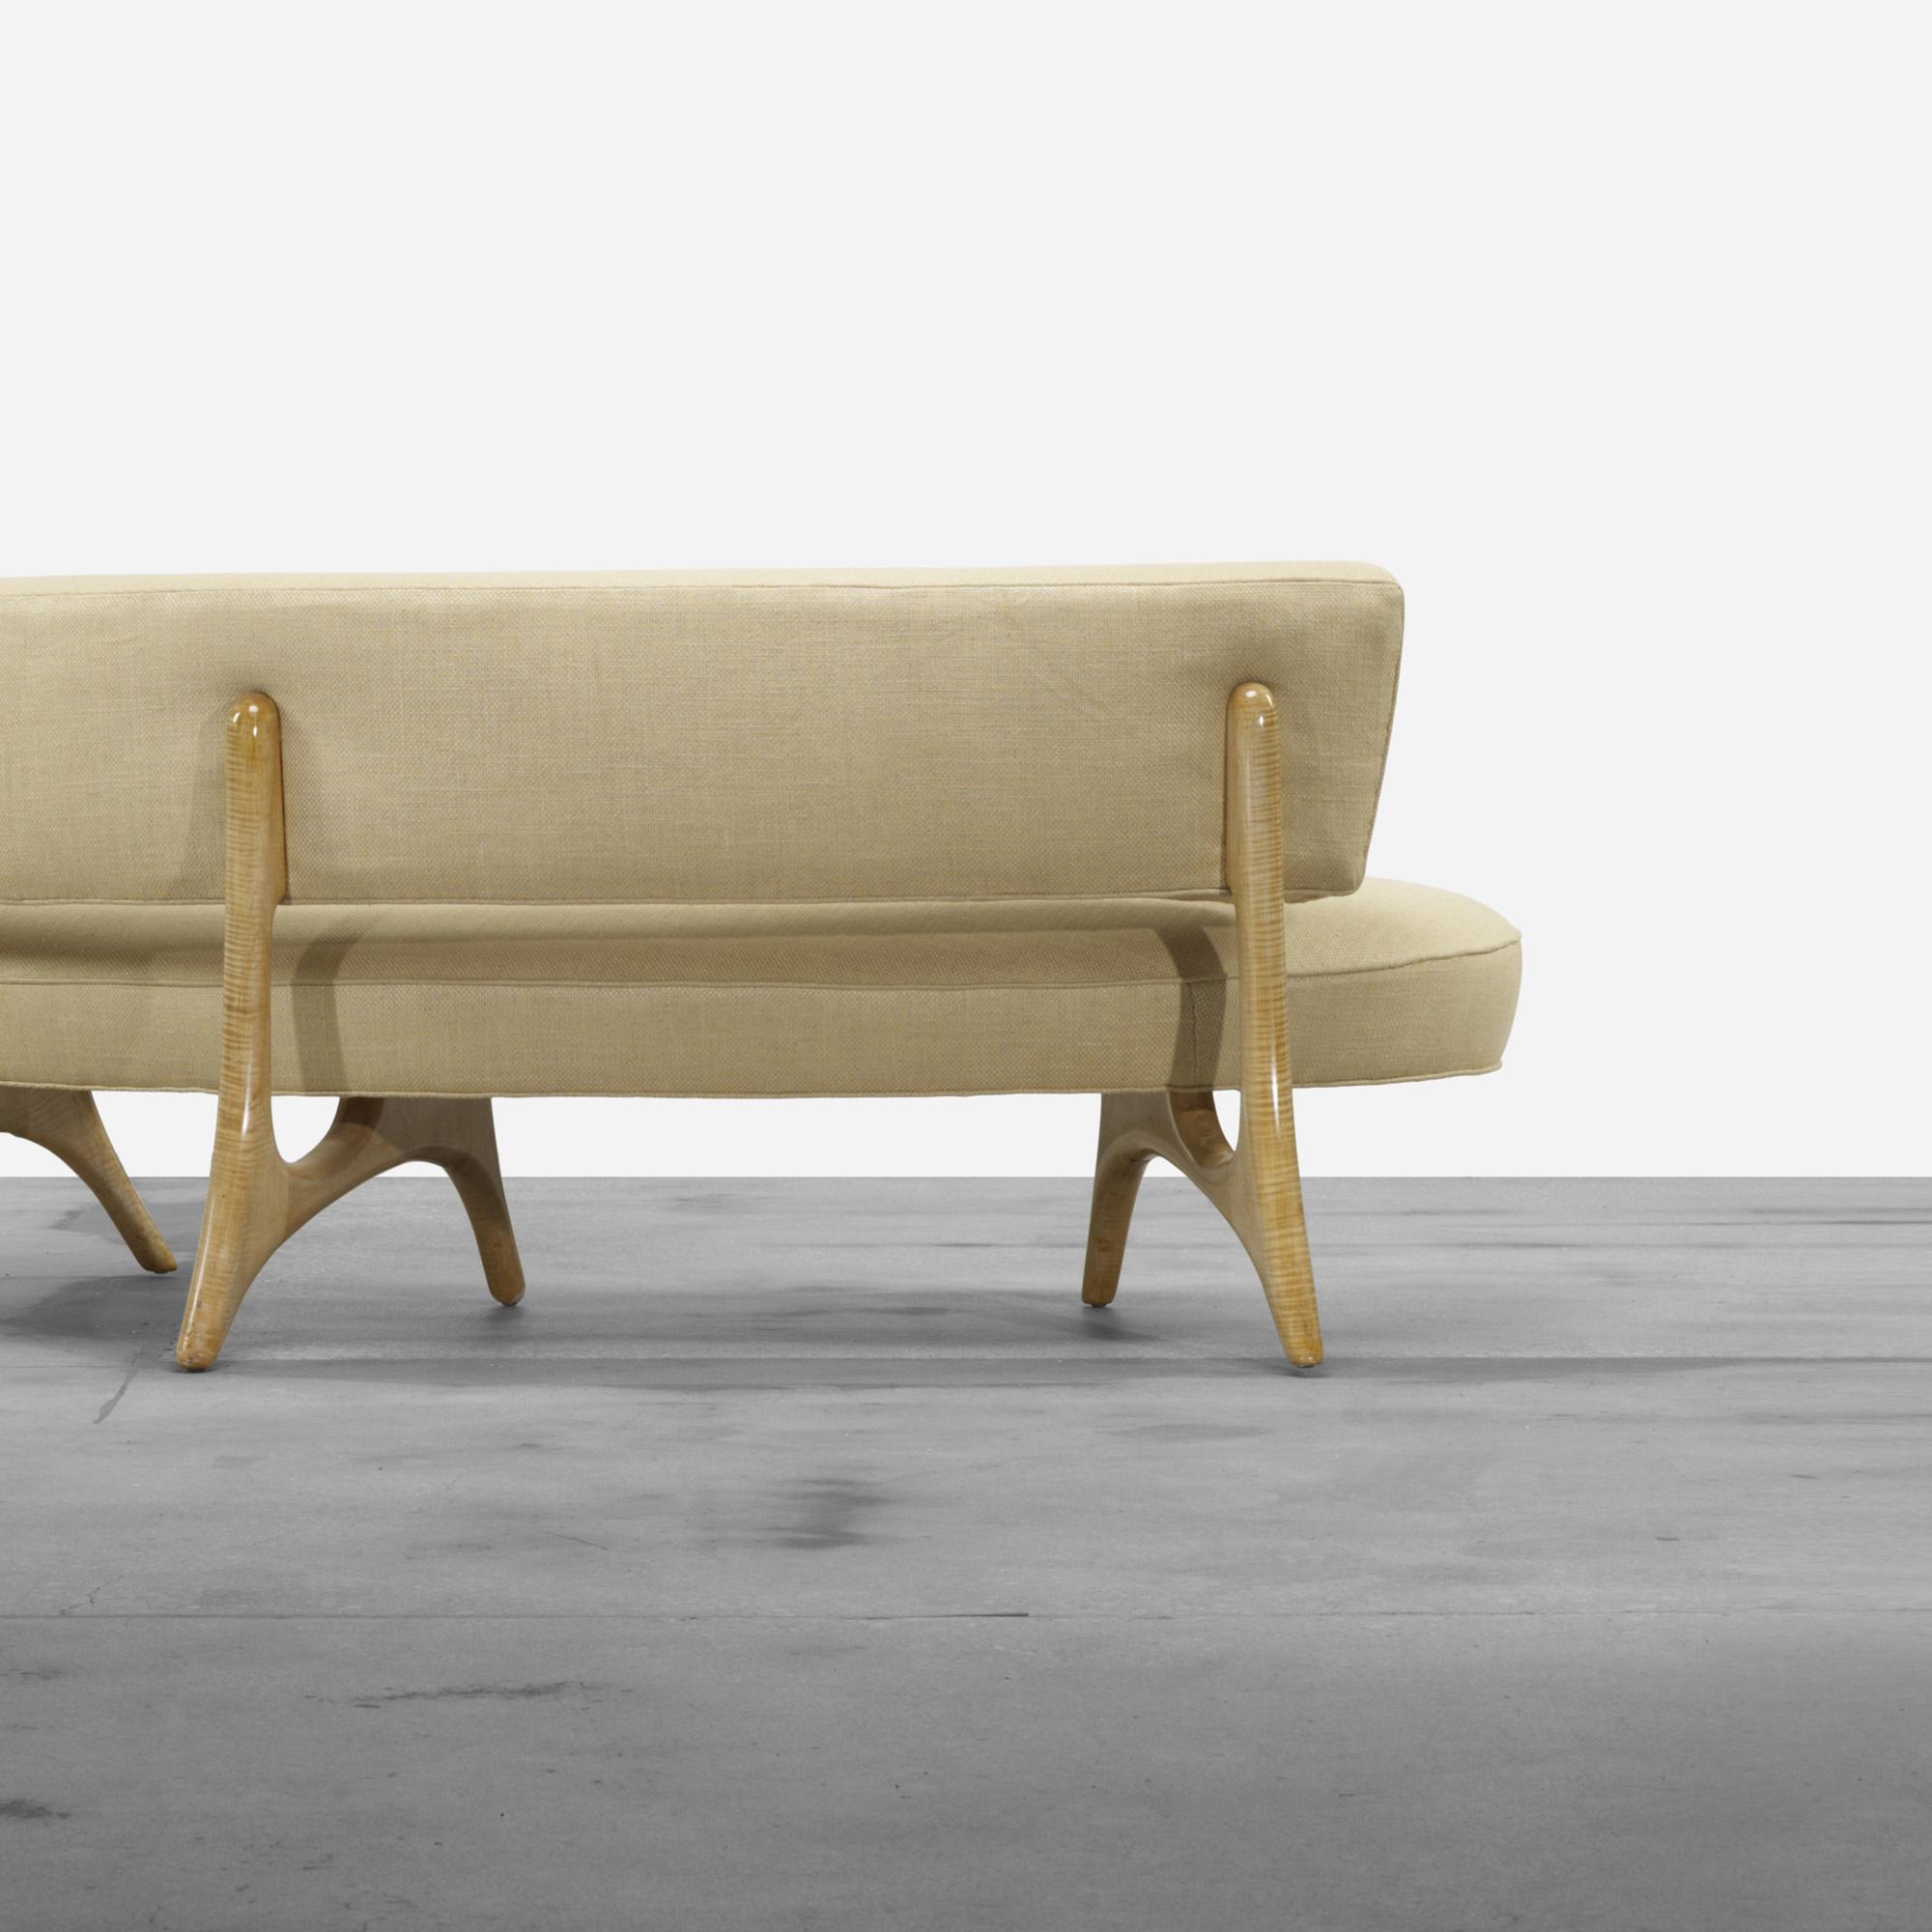 196 Vladimir Kagan Floating Curve sofa Living Contemporary